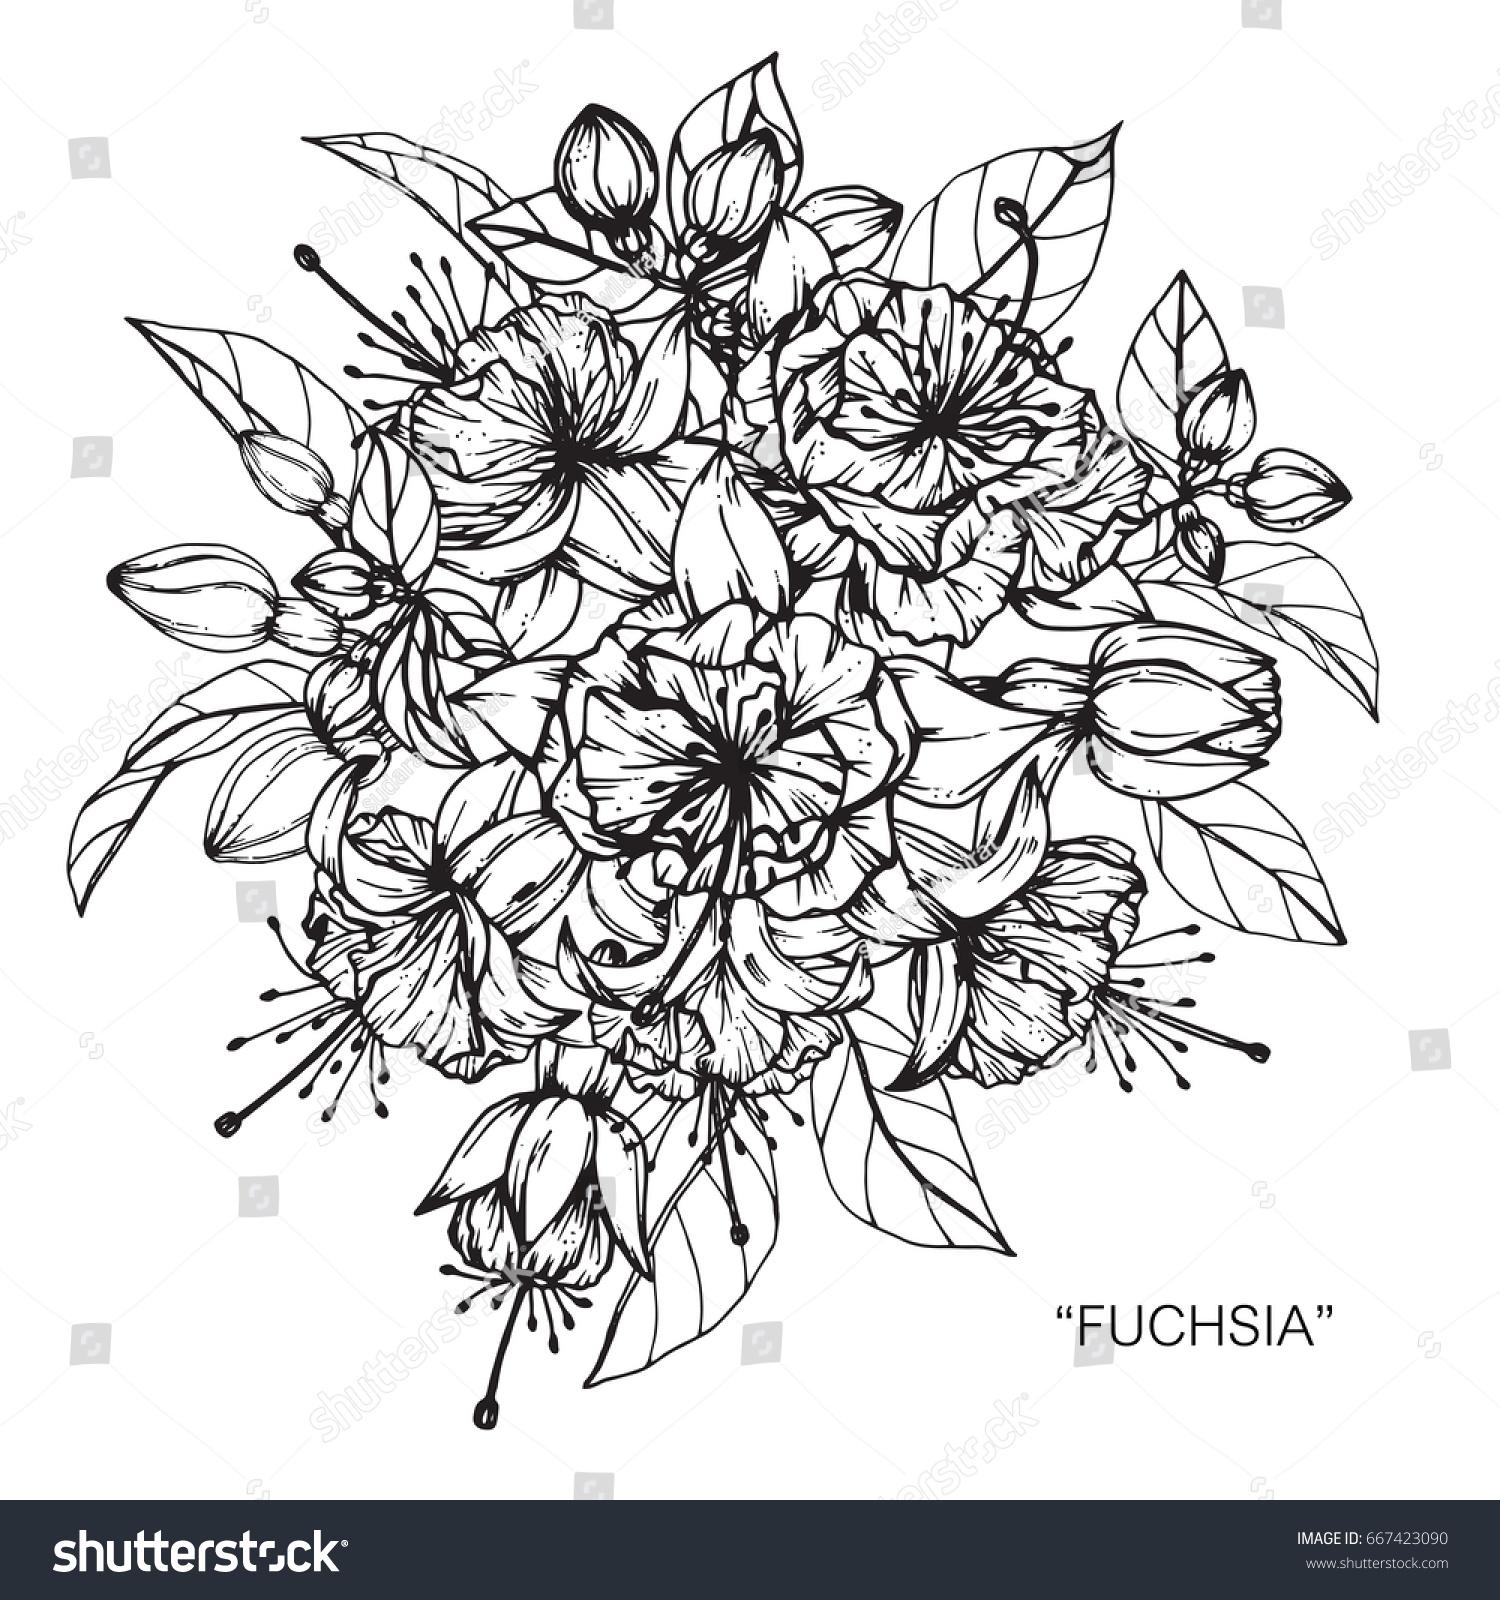 Flower Bouquet Line Drawing : Bouquet fuchsia flowers drawing sketch lineart stock